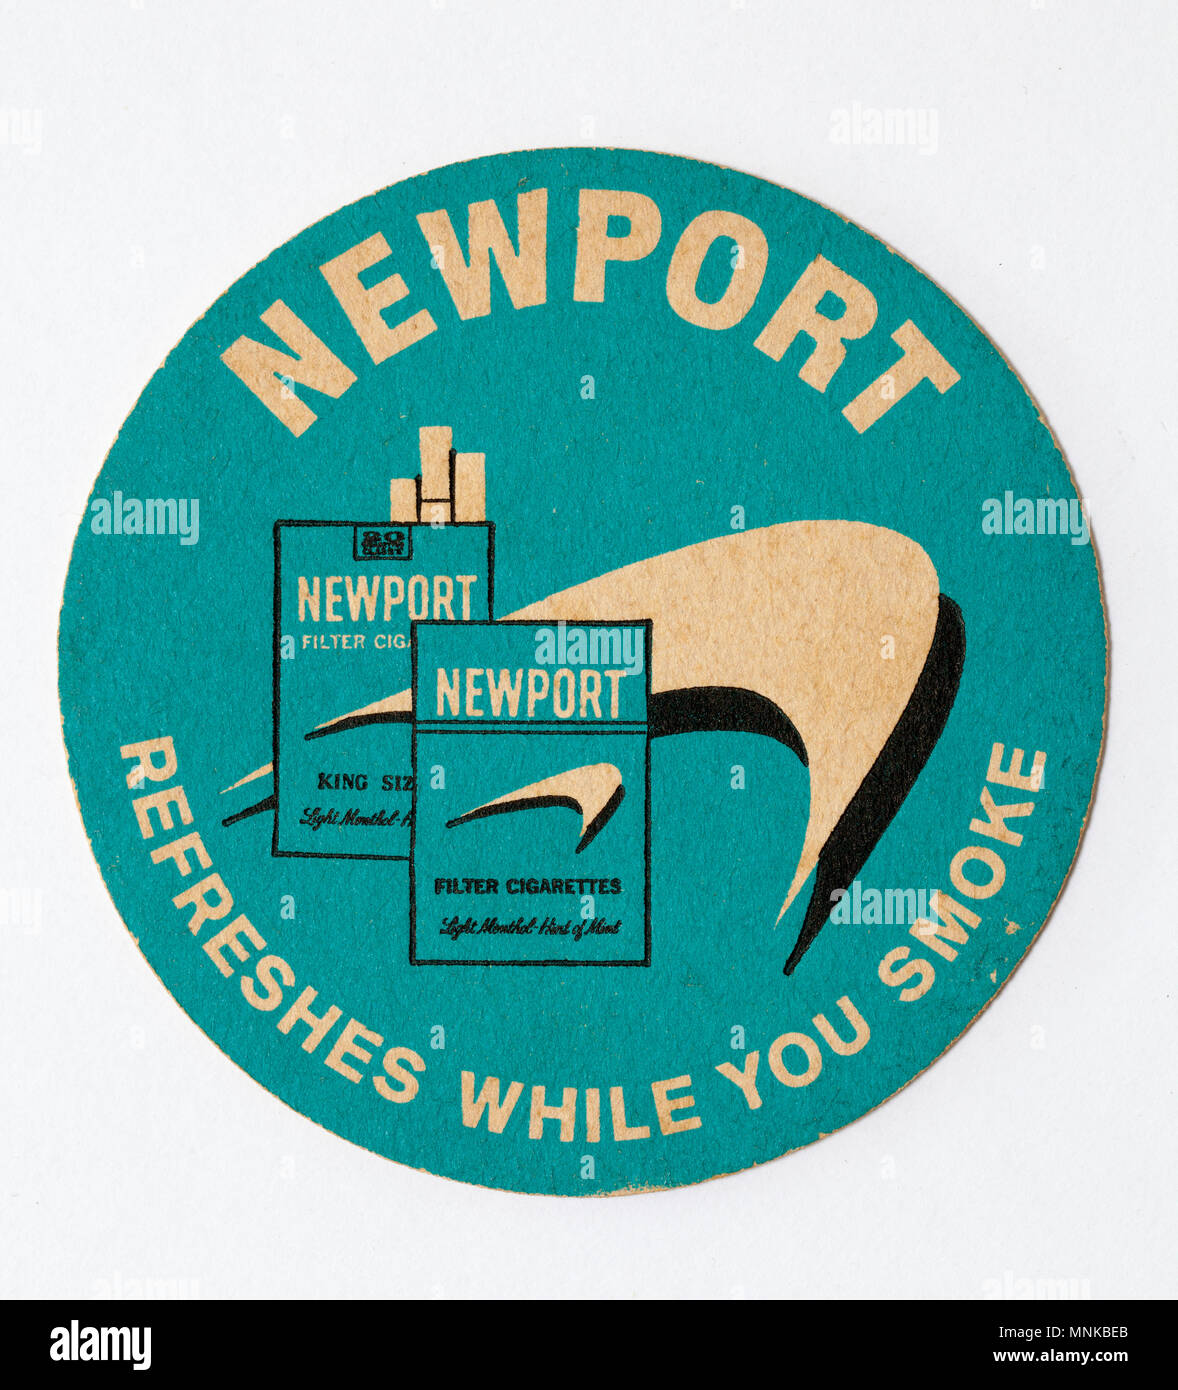 Vintage Beer Mat Advertising Newport Cigarettes Stock Photo